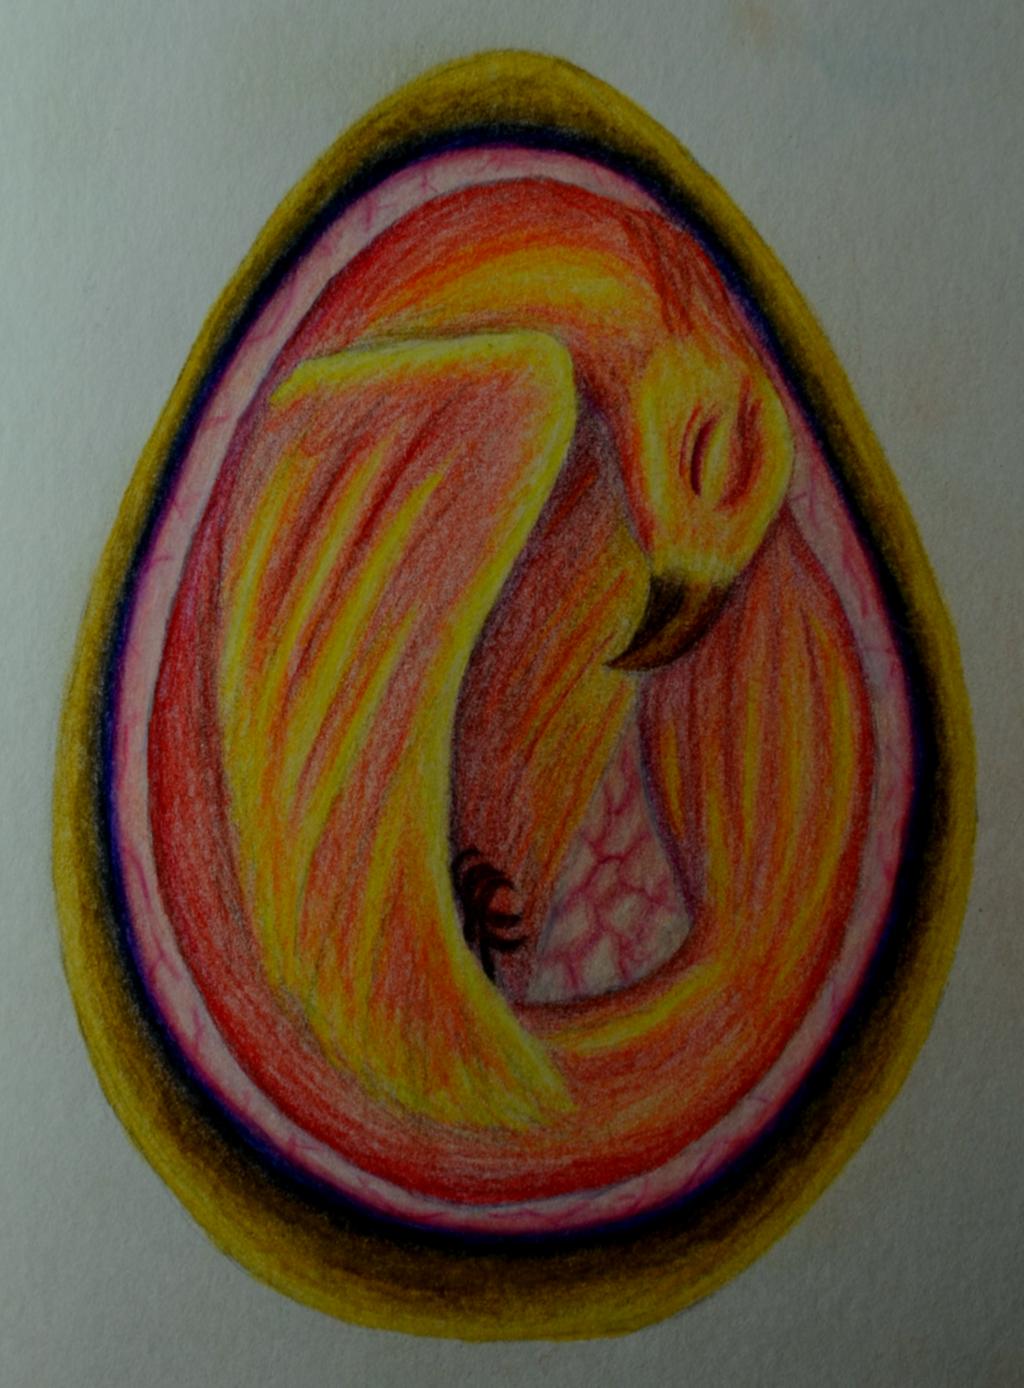 Phoenix egg by Palasferas